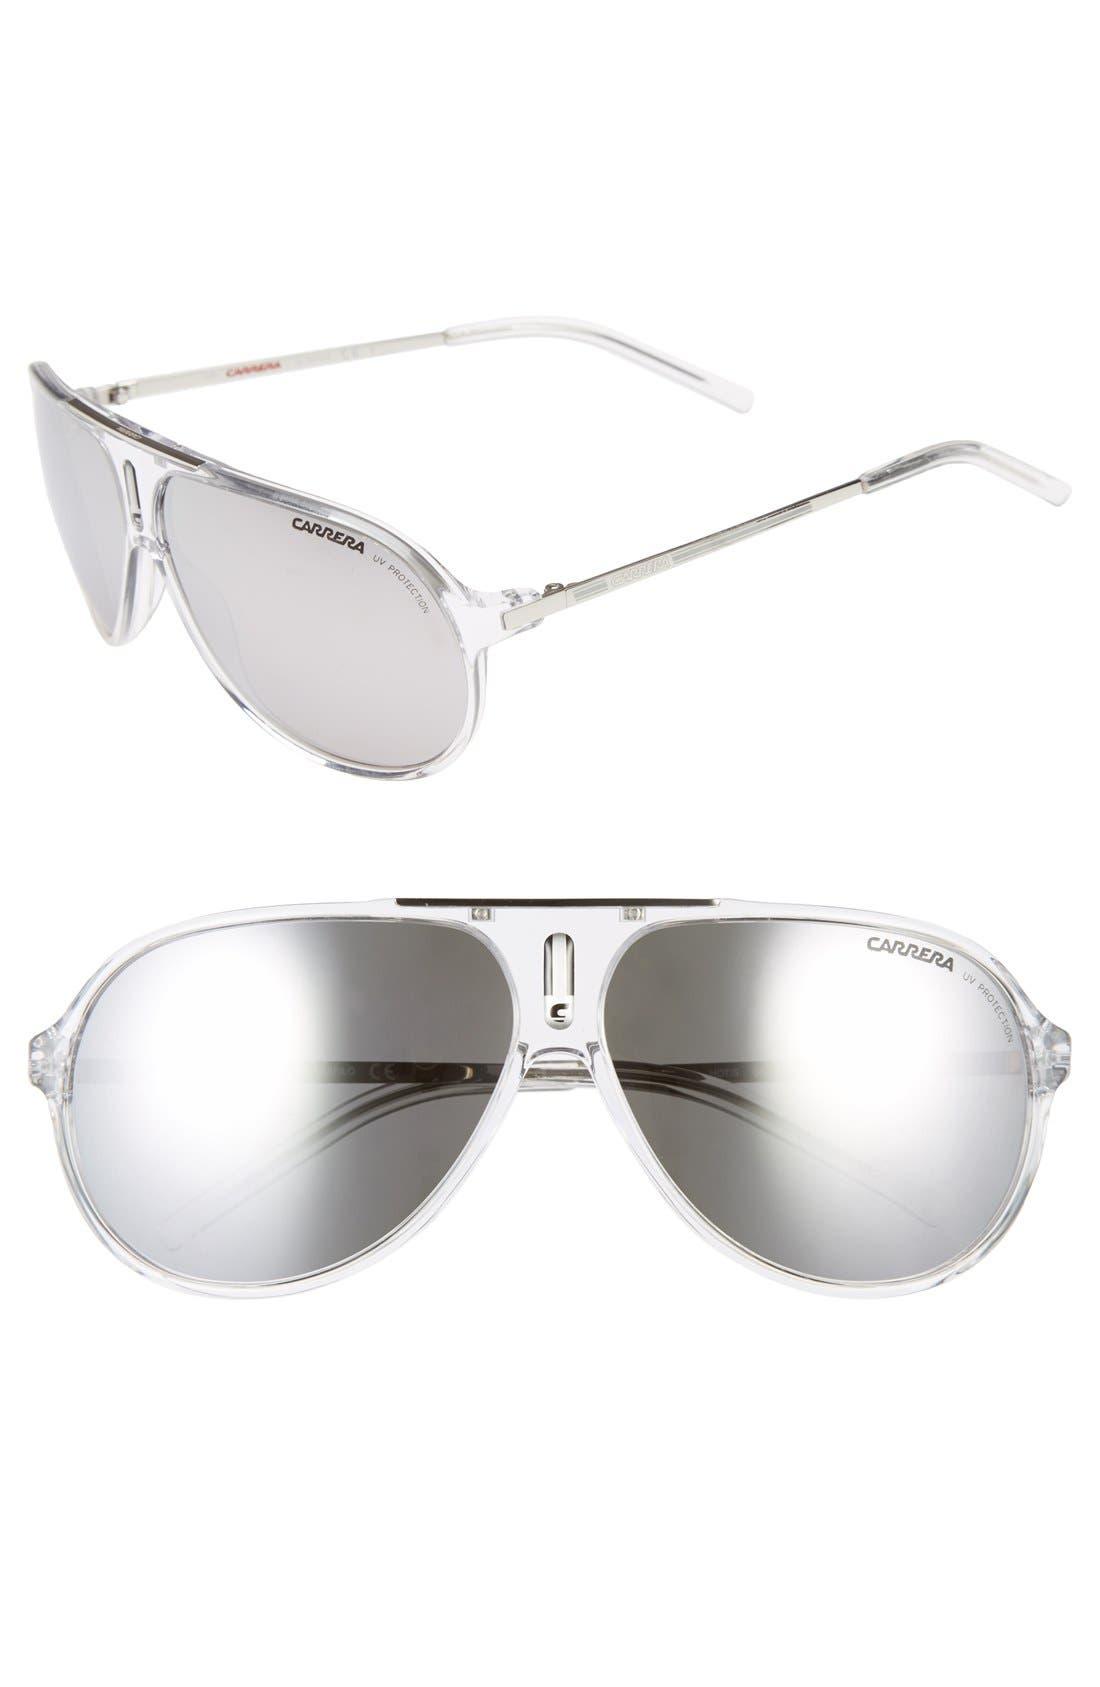 Carrera Eyewear 'Hots' 64mm Aviator Sunglasses